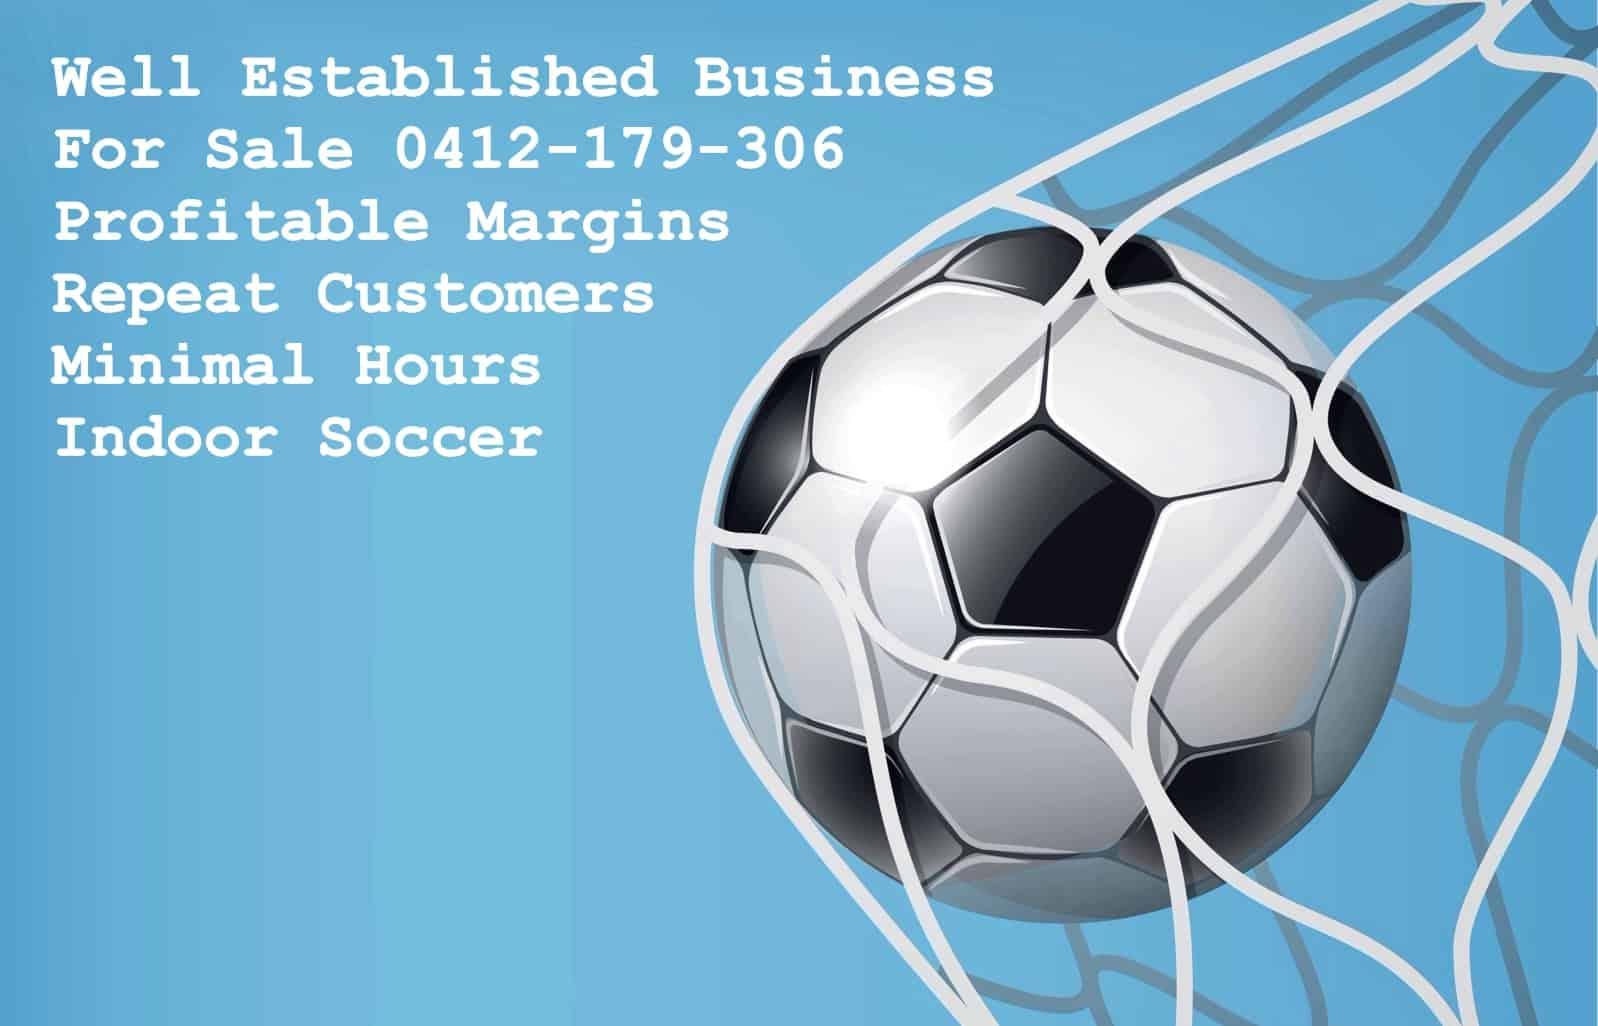 Indoor Soccer Business for sale 0412 179 306Indoor Soccer Business for sale 0412 179 306